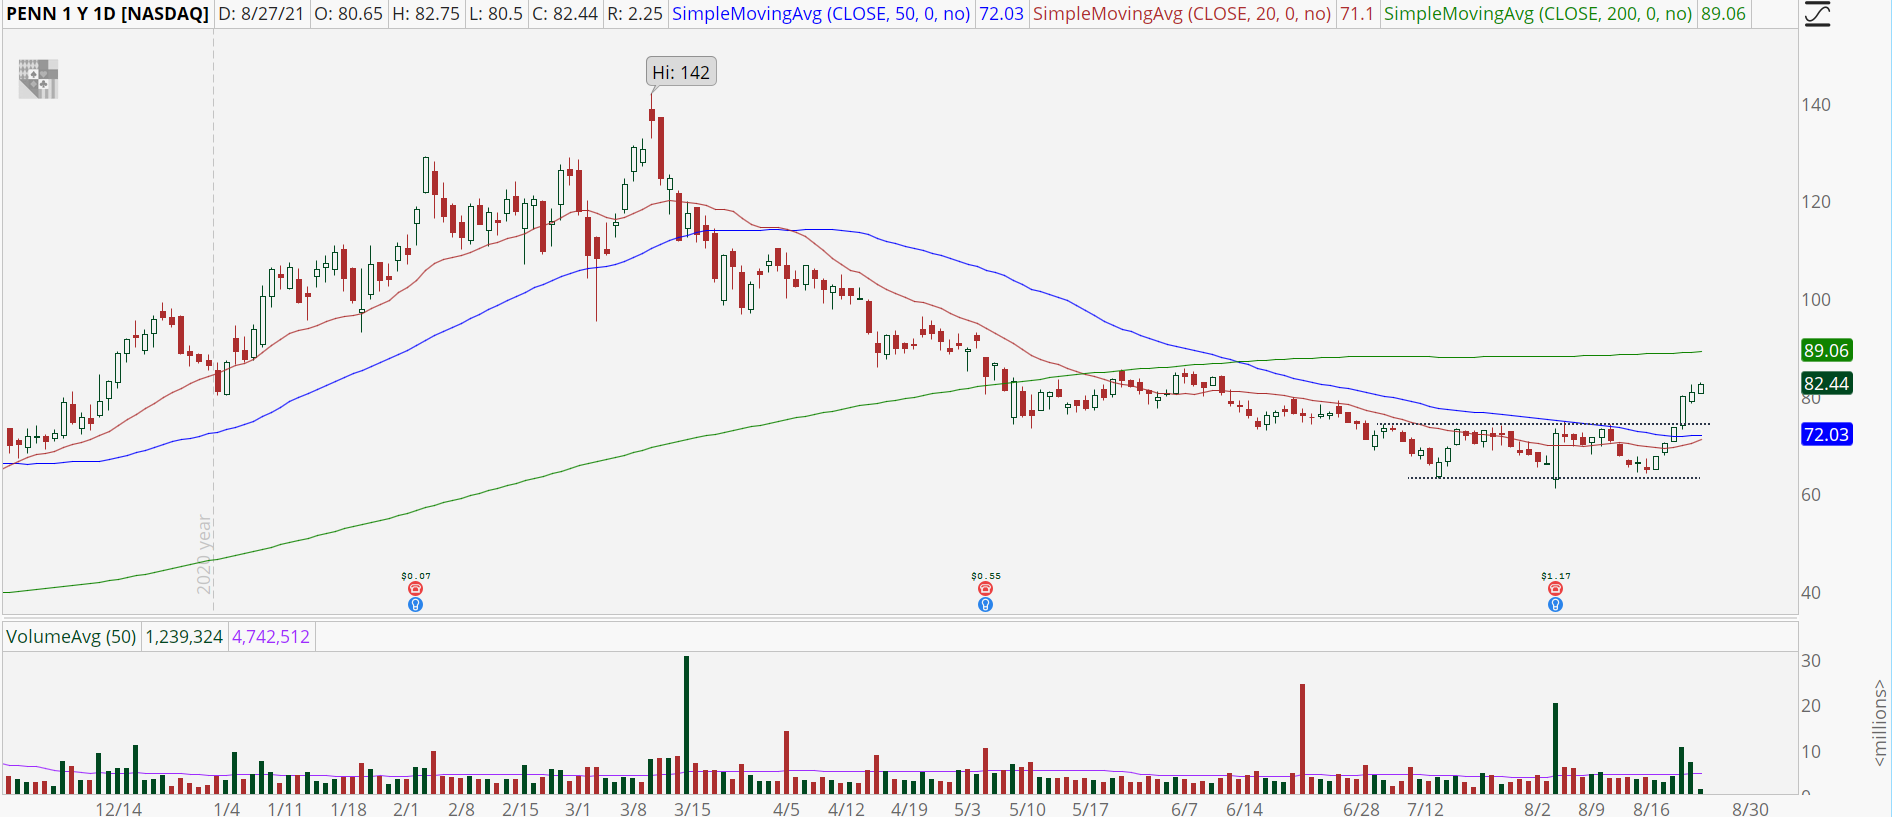 Penn National Gaming (PENN) stock chart with trend reversal